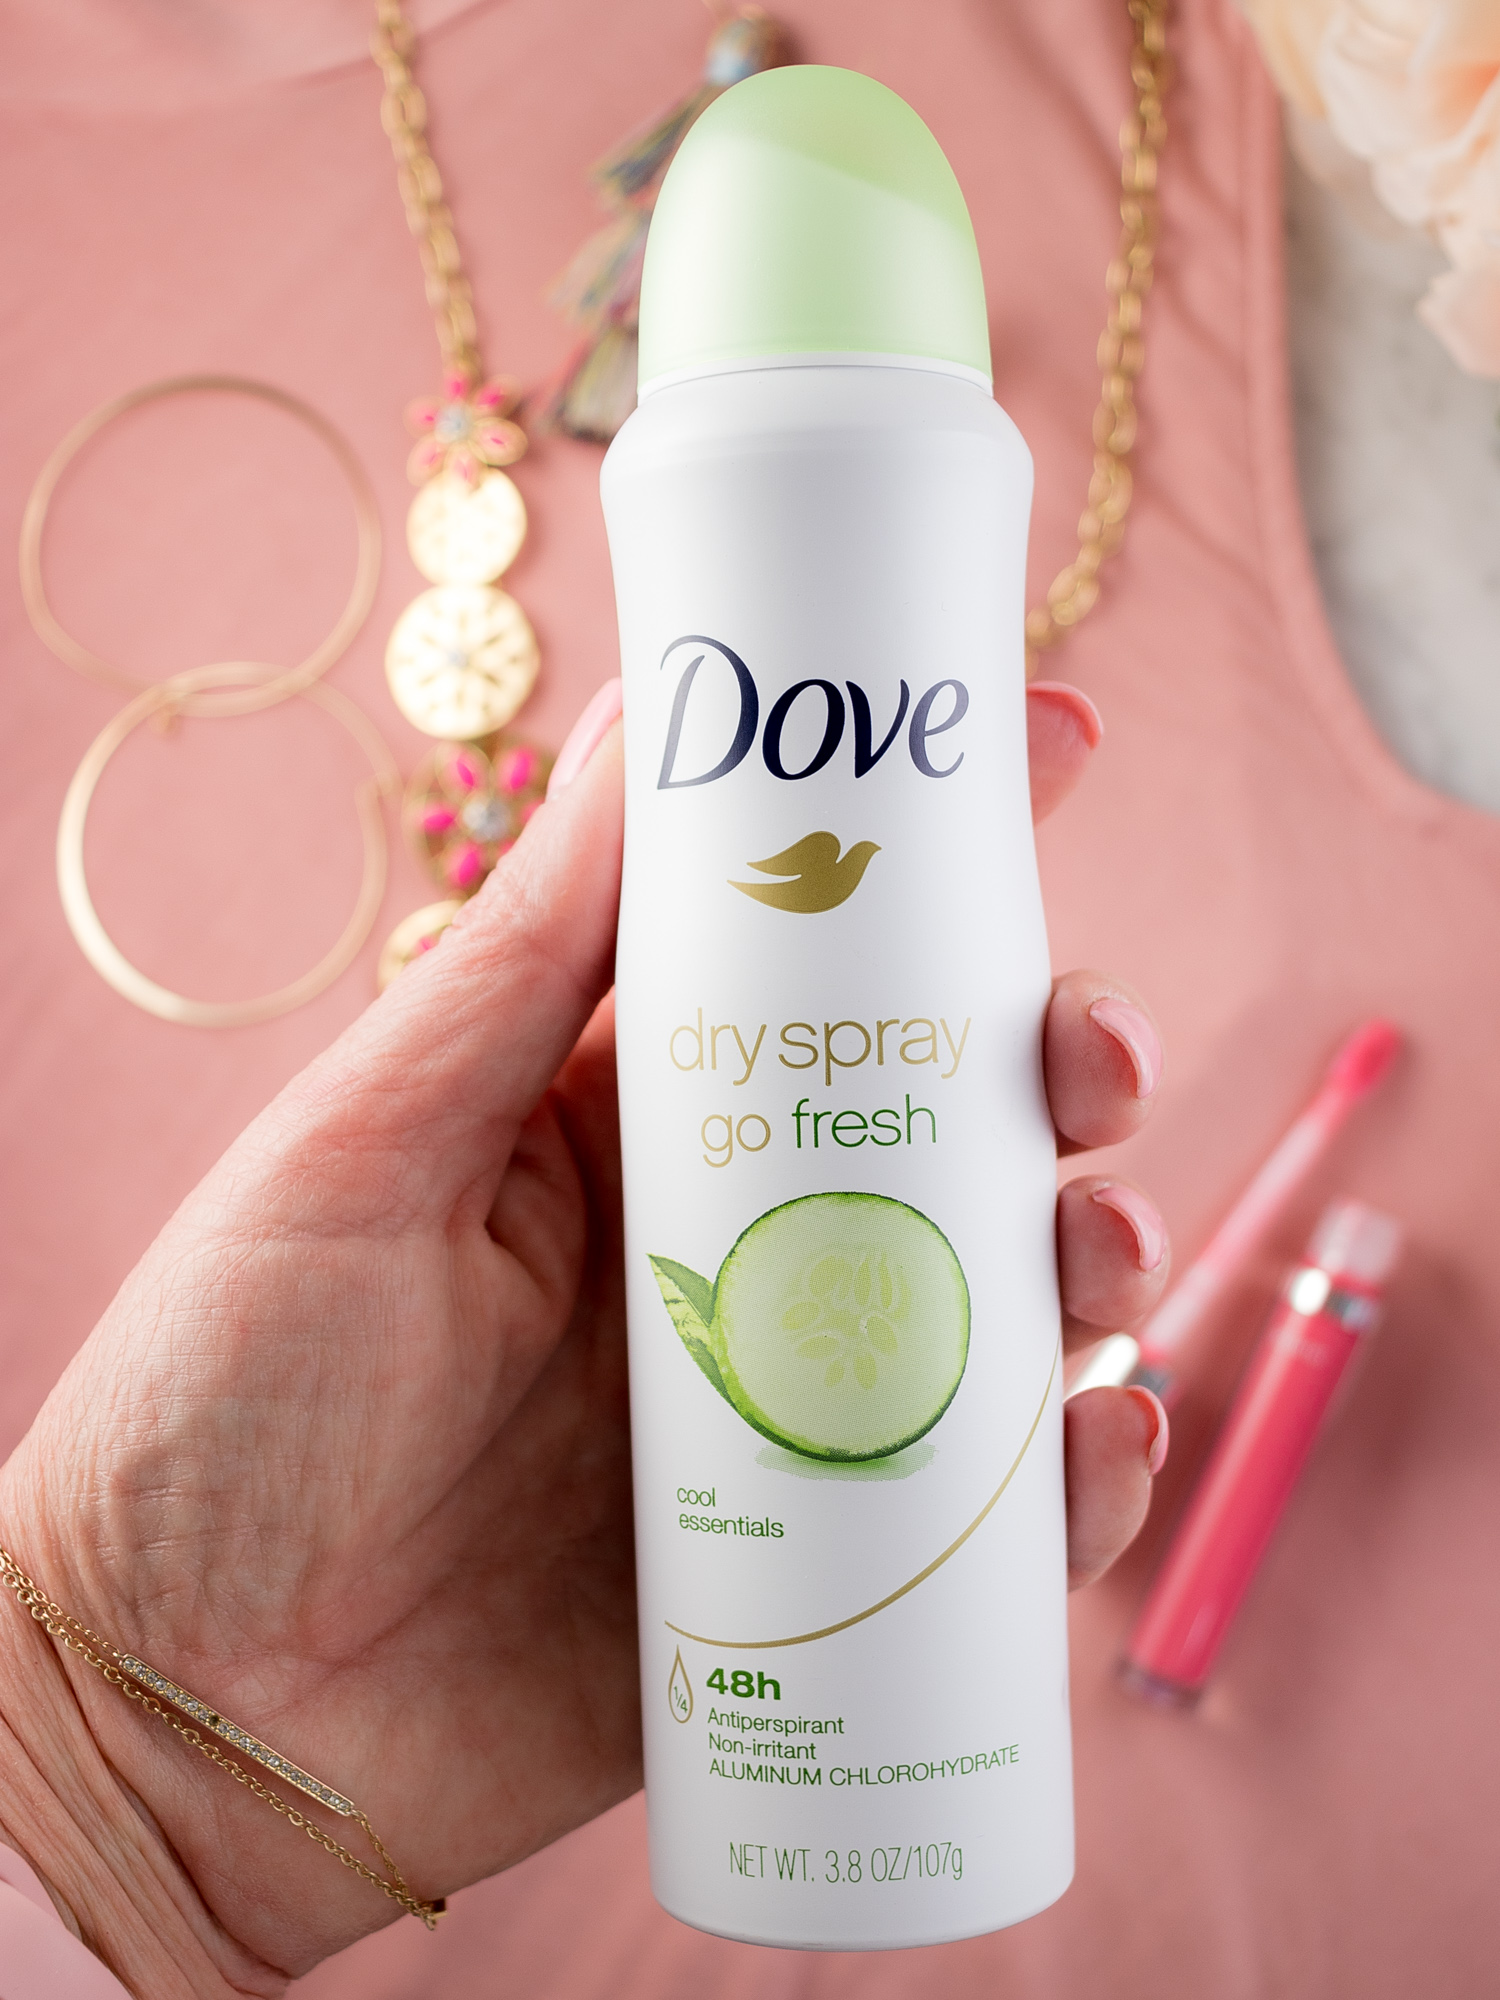 Dove Dry Spray Go Fresh